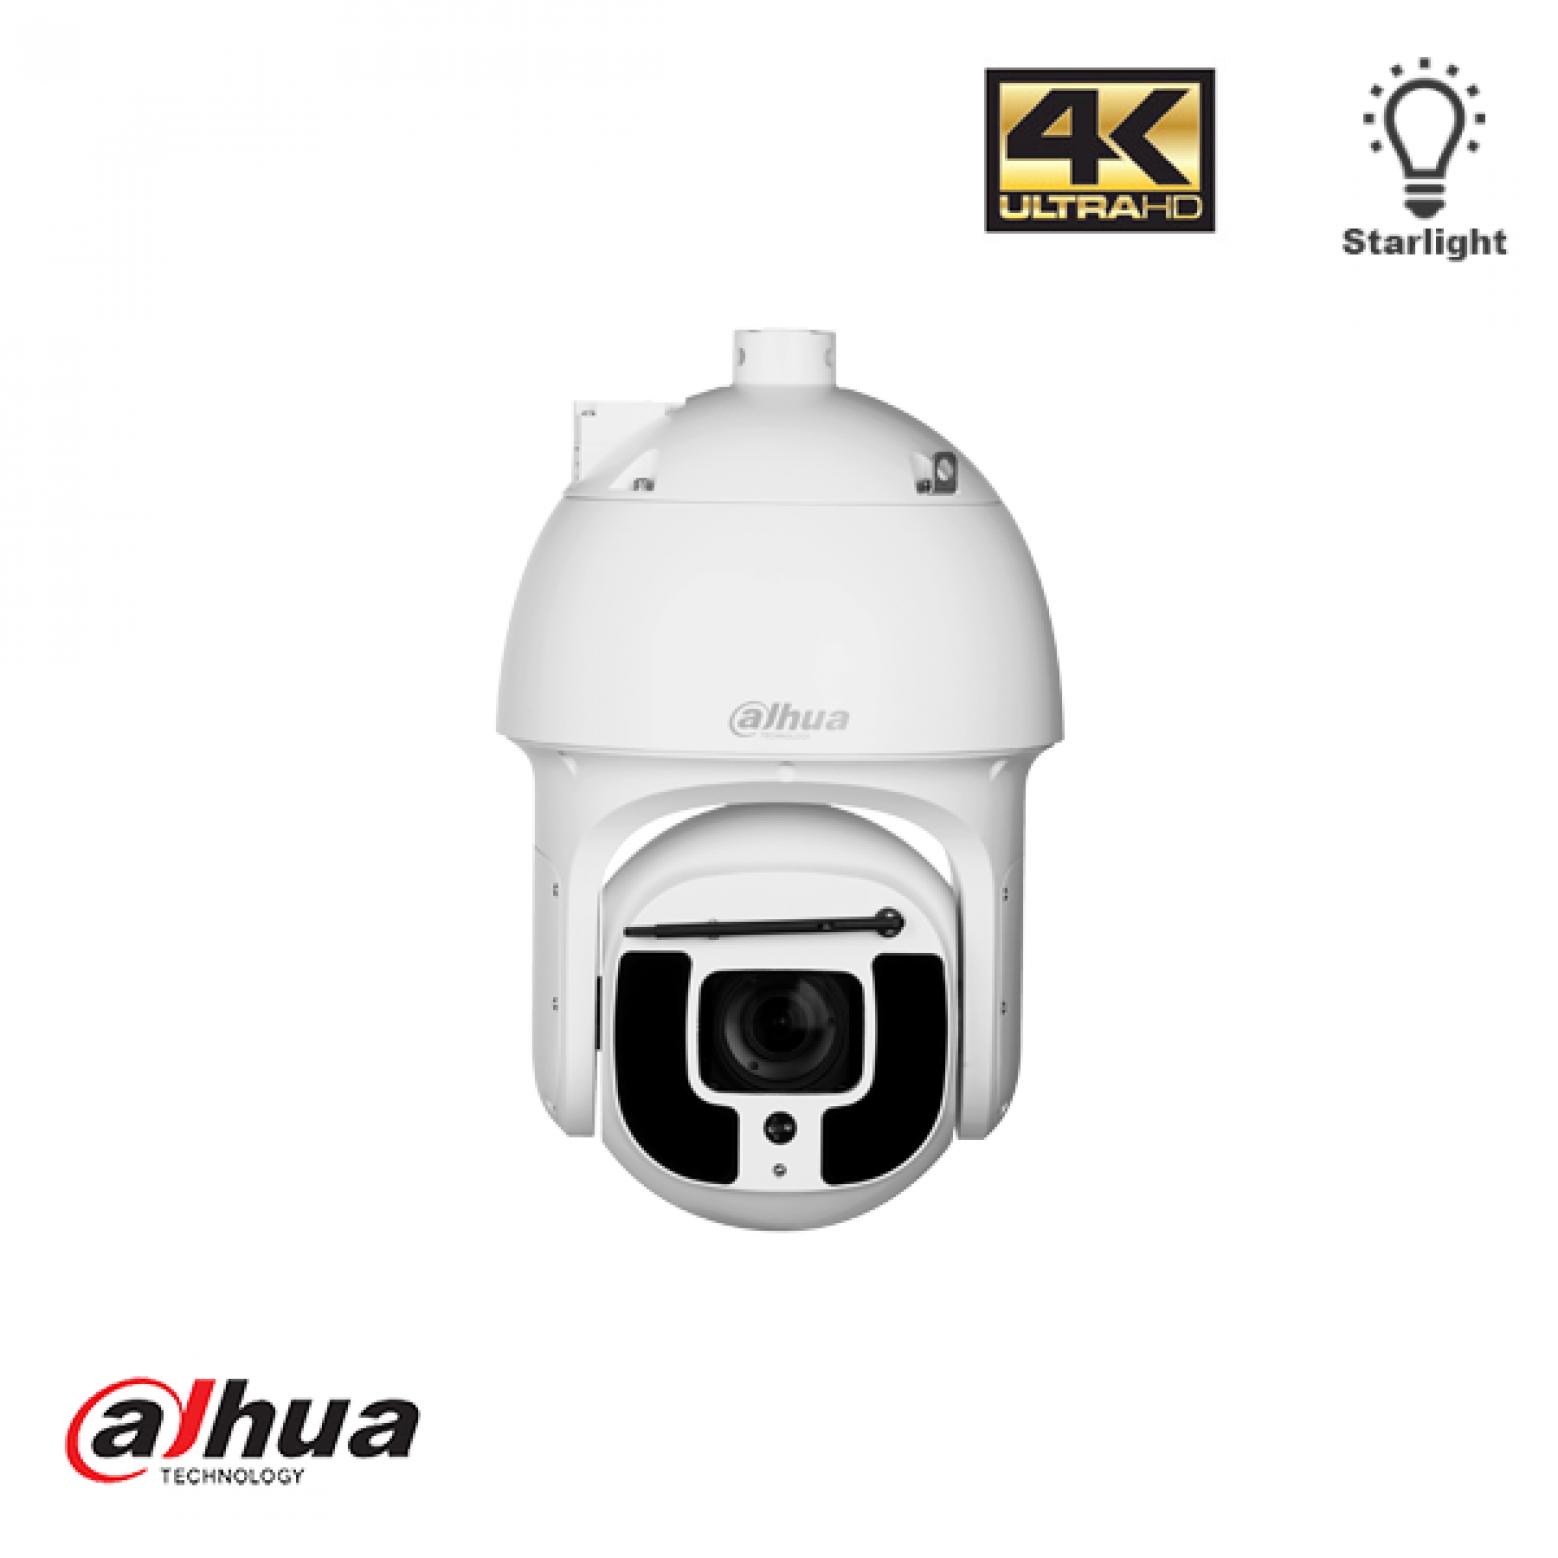 Dahua SD8A840WA-HNF 4K 40x Starlight 500 meter IR PTZ AI Network PTZ Camera